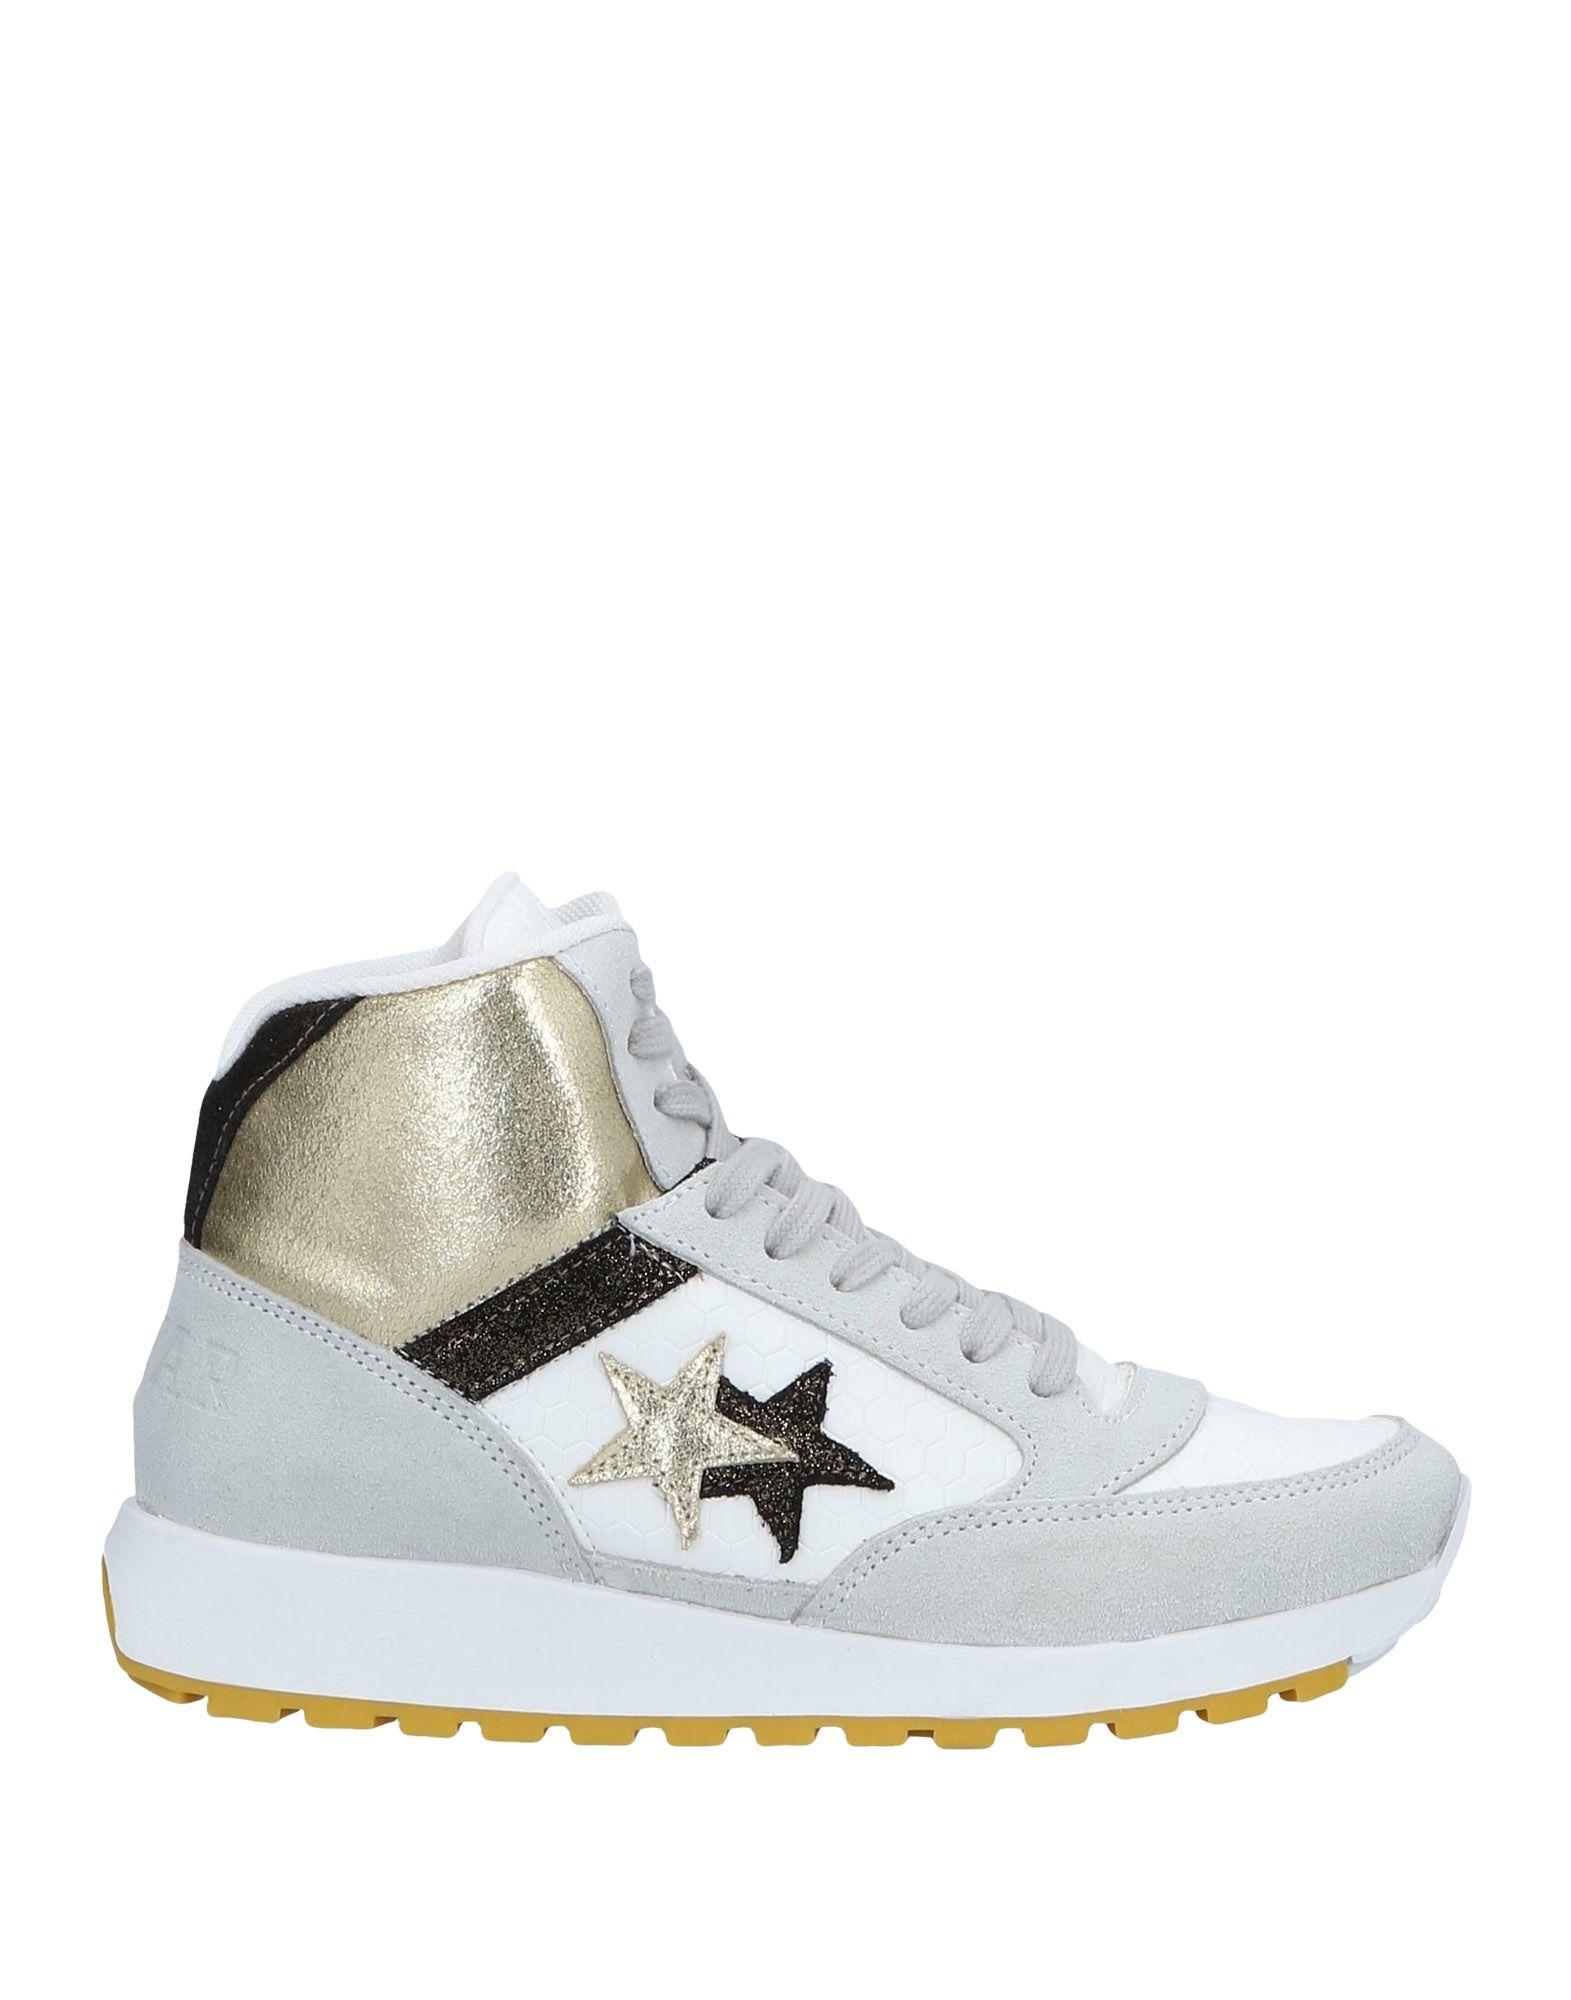 Sneakers 2Star Donna - 11521136UD elegante